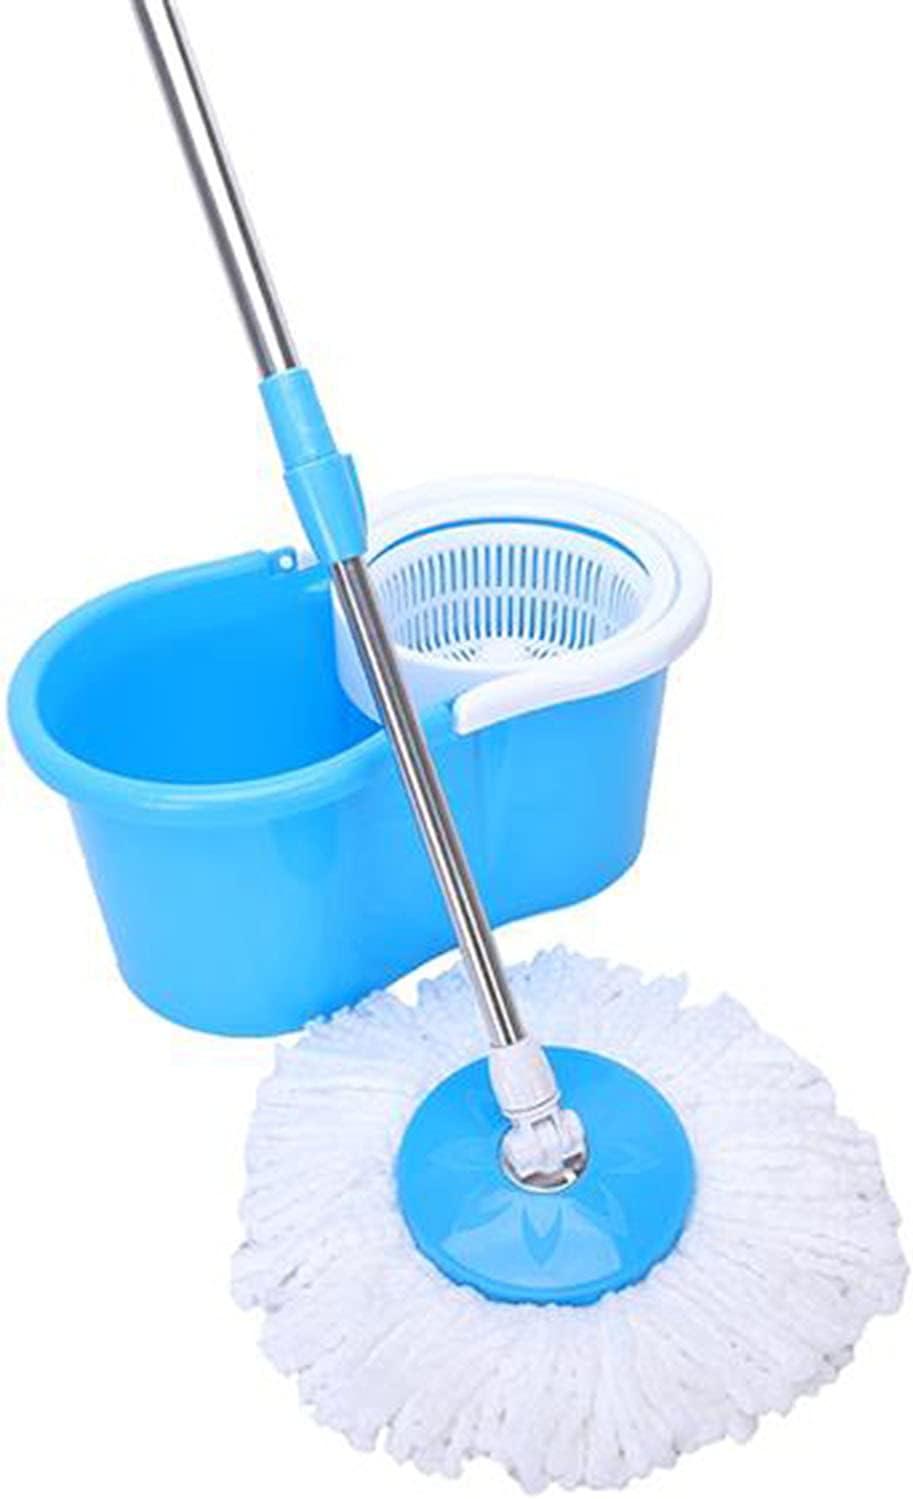 Microfiber Dallas Mall Spin Mop New item 360° Cleaning Floor Bucket System